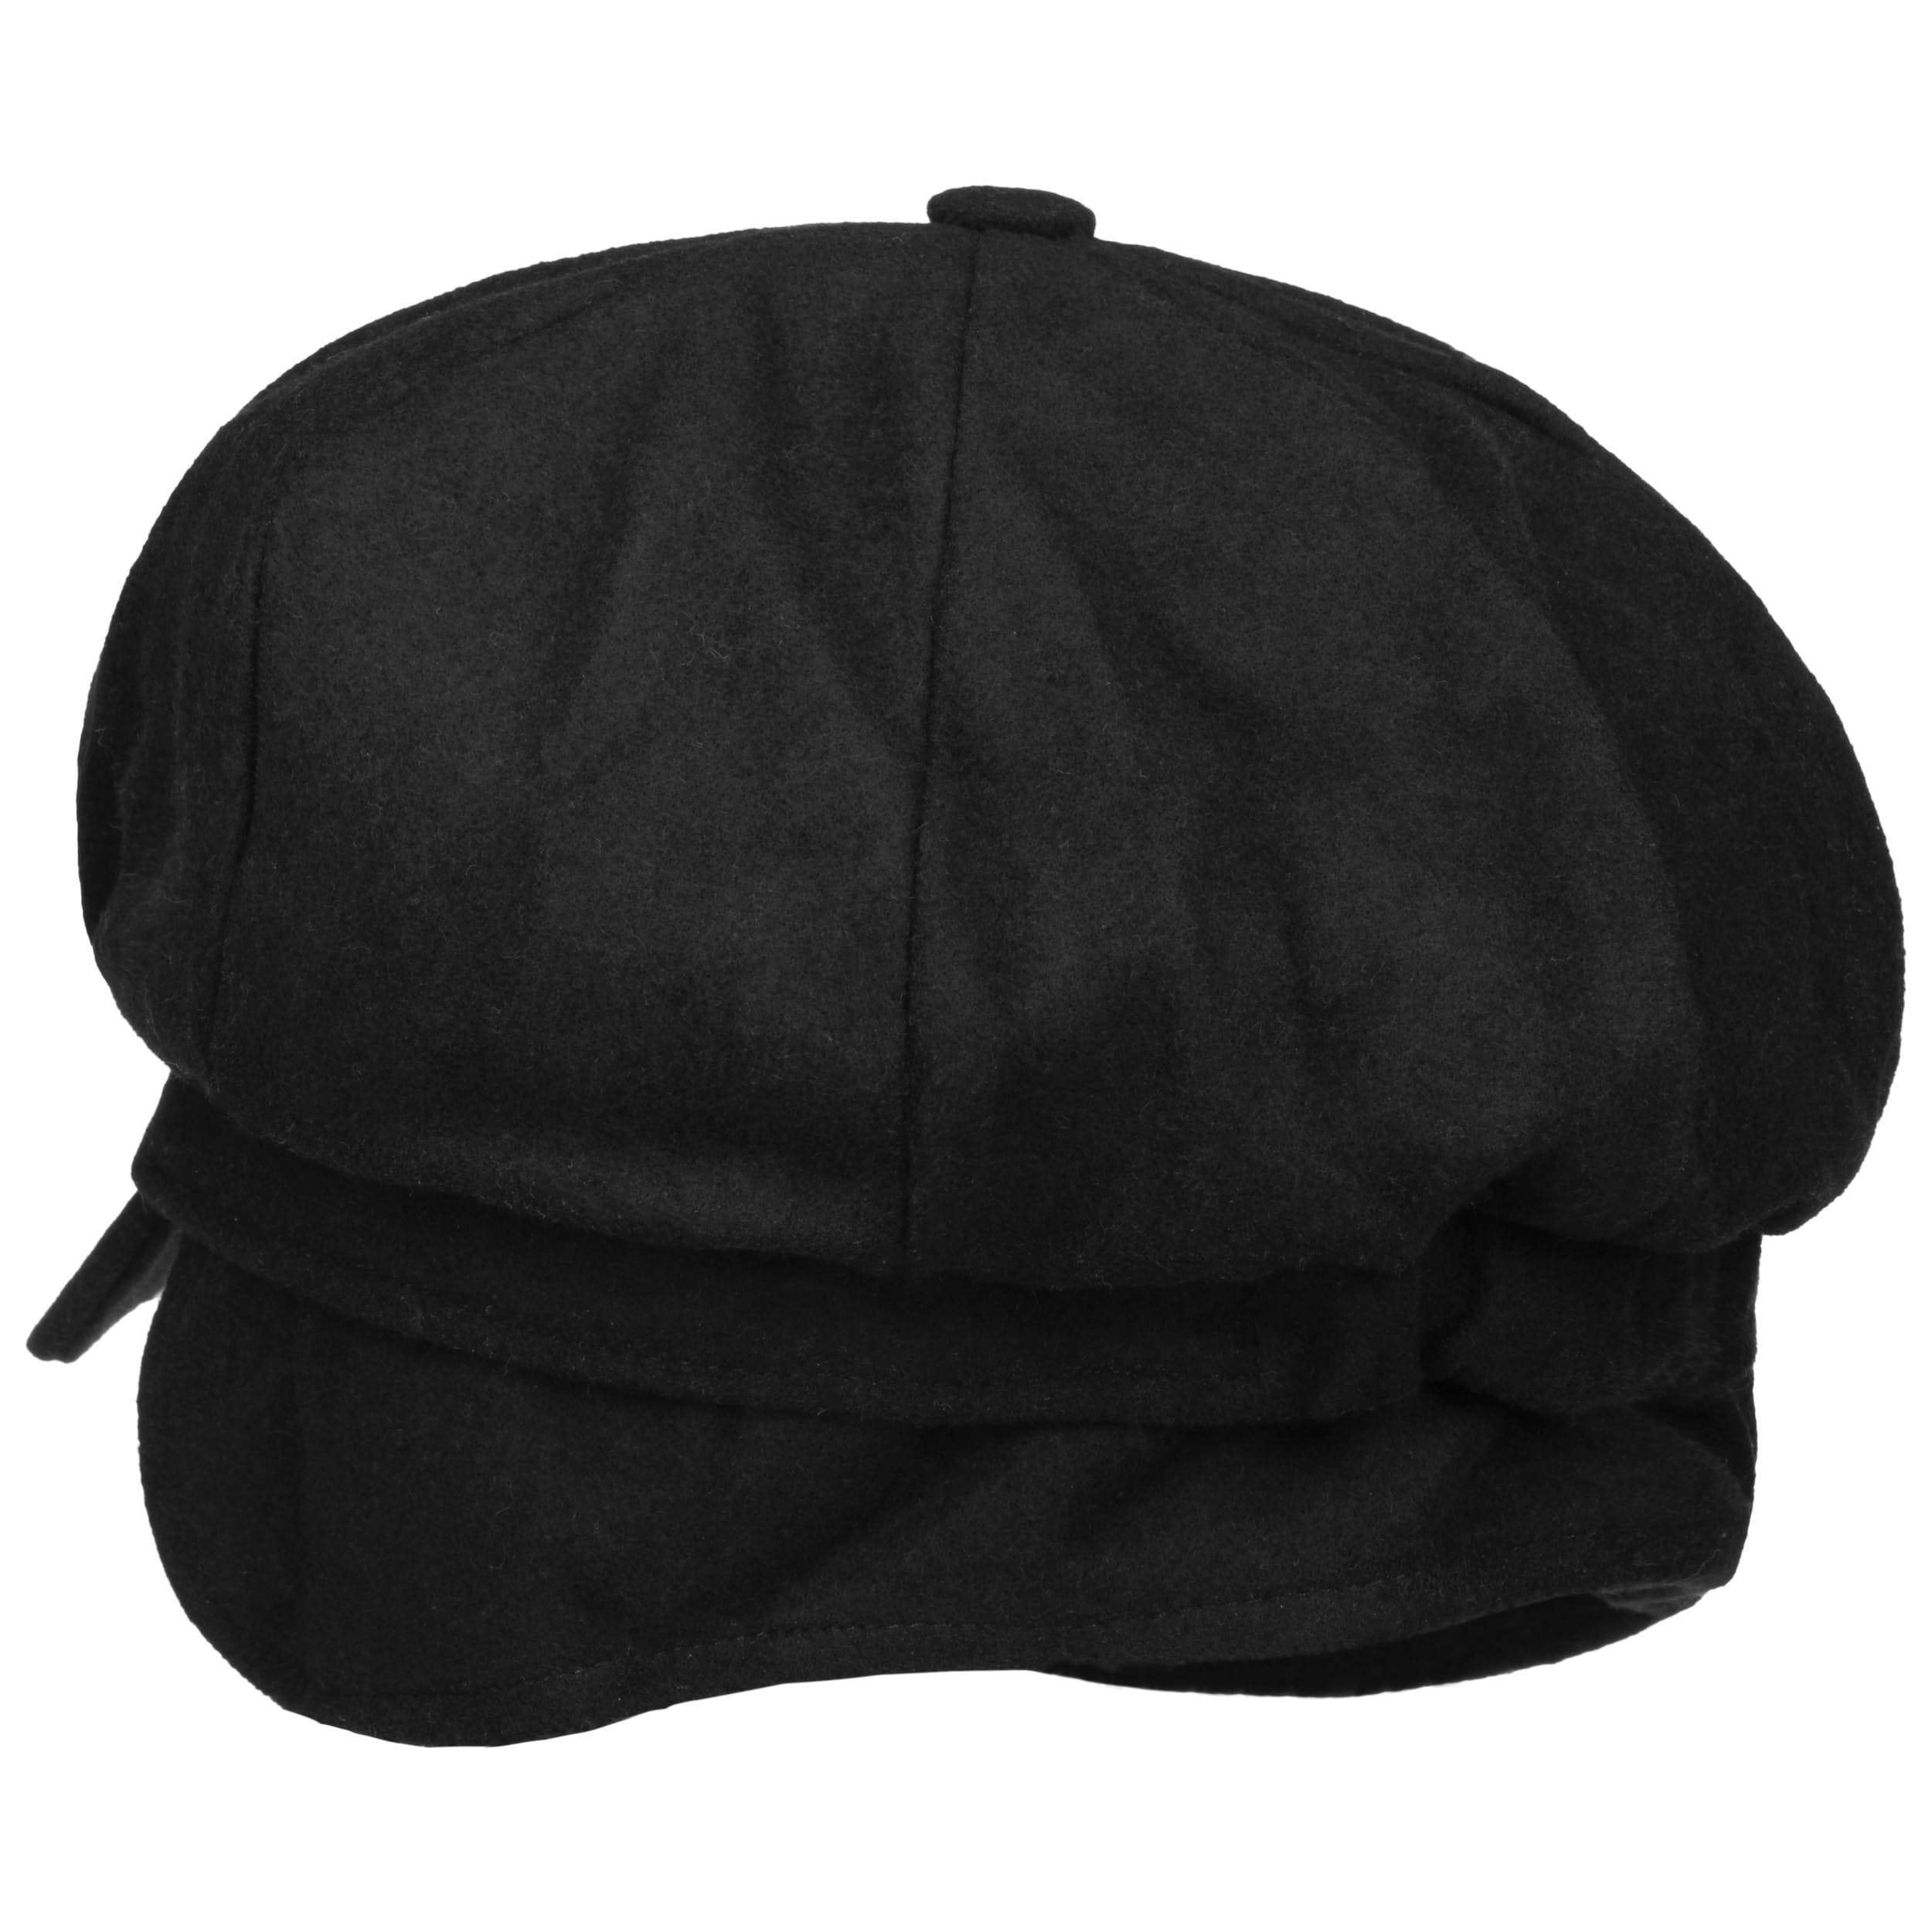 ... Liseta Newsboy Cap with Ear Flaps by Lipodo - black 3 ... a9a7f6d906f